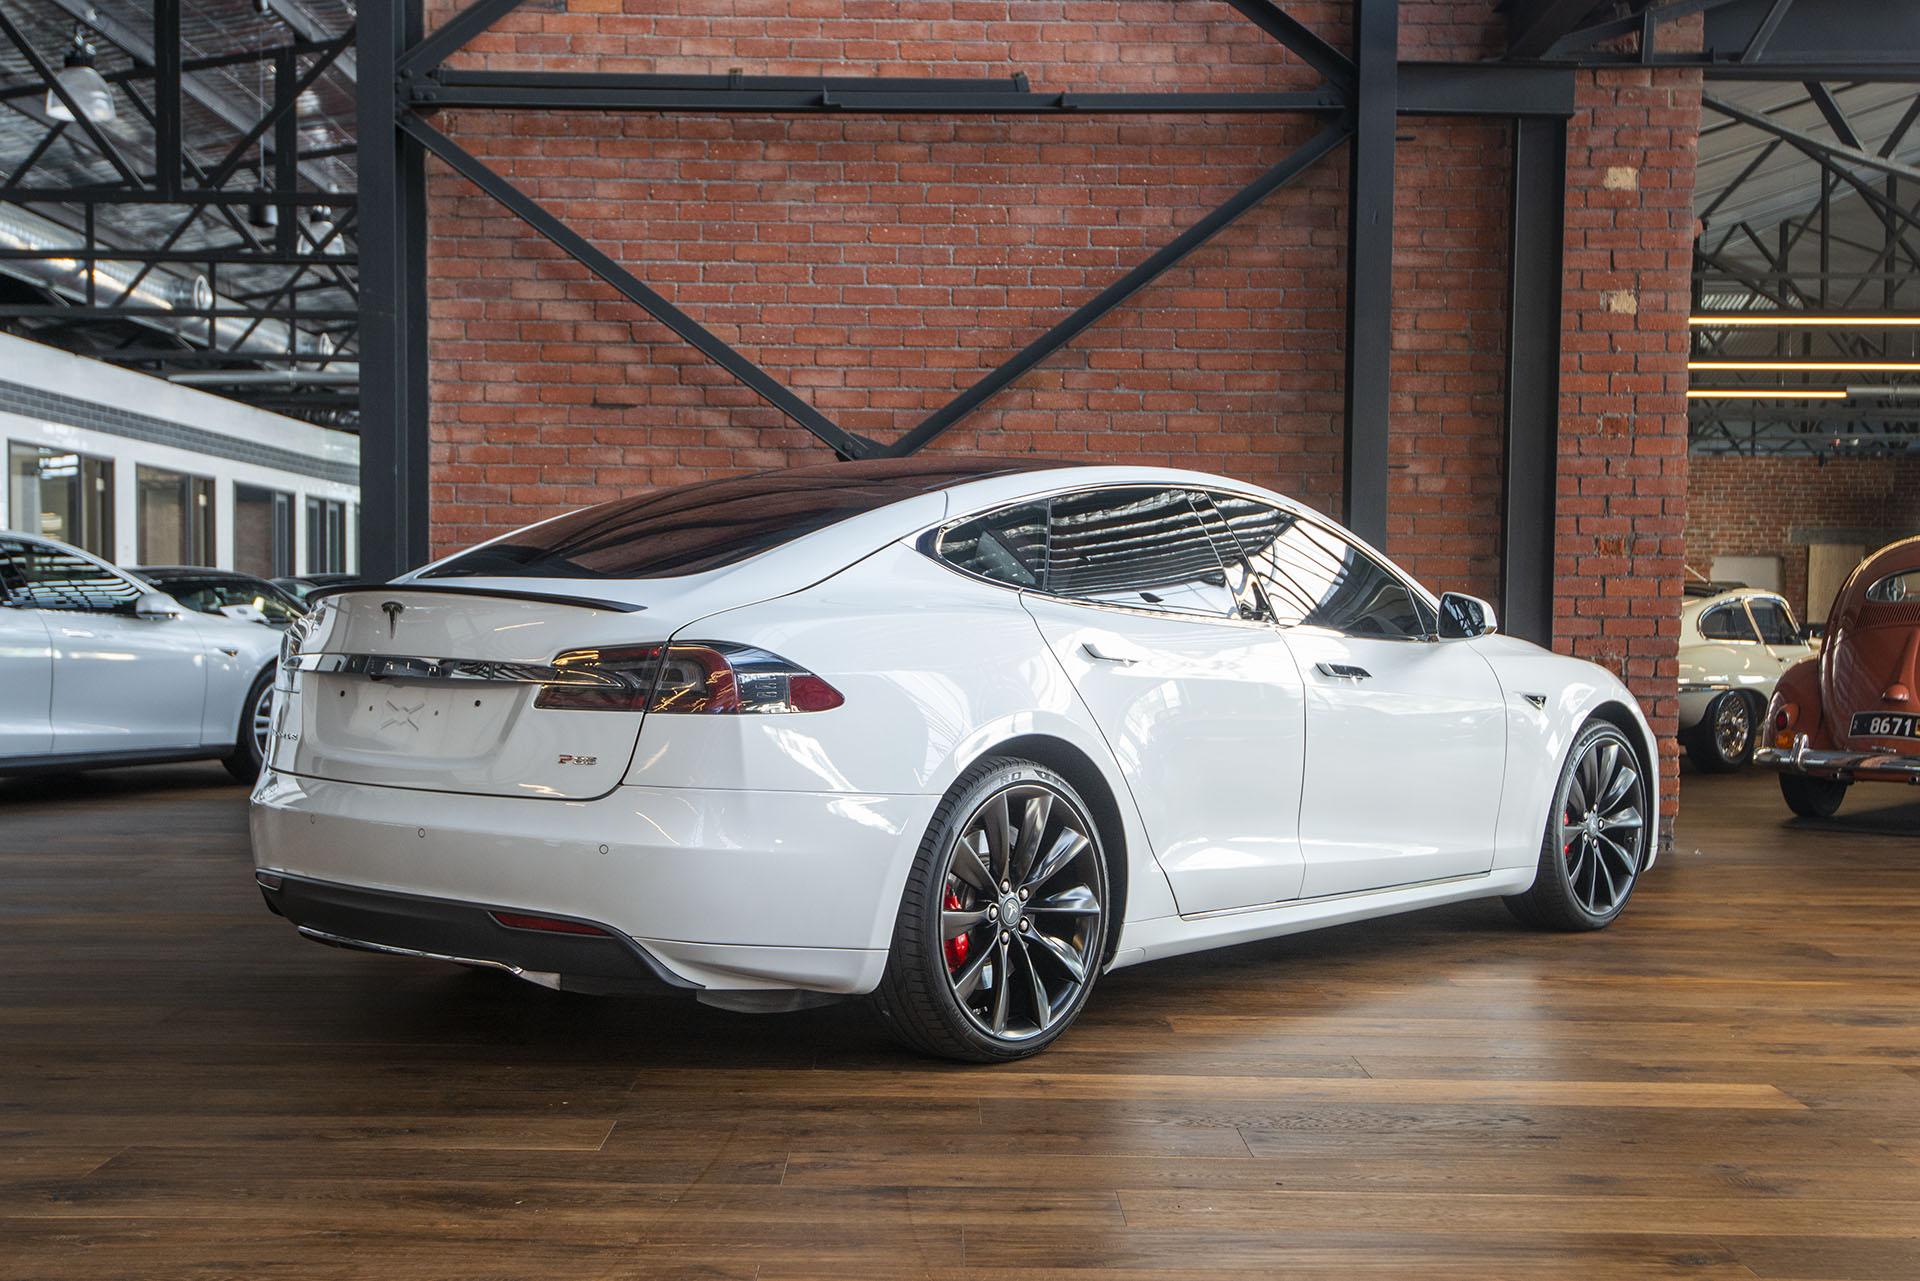 Body Central Sale >> 2014 Tesla Model S P85 Sportback - Richmonds - Classic and ...